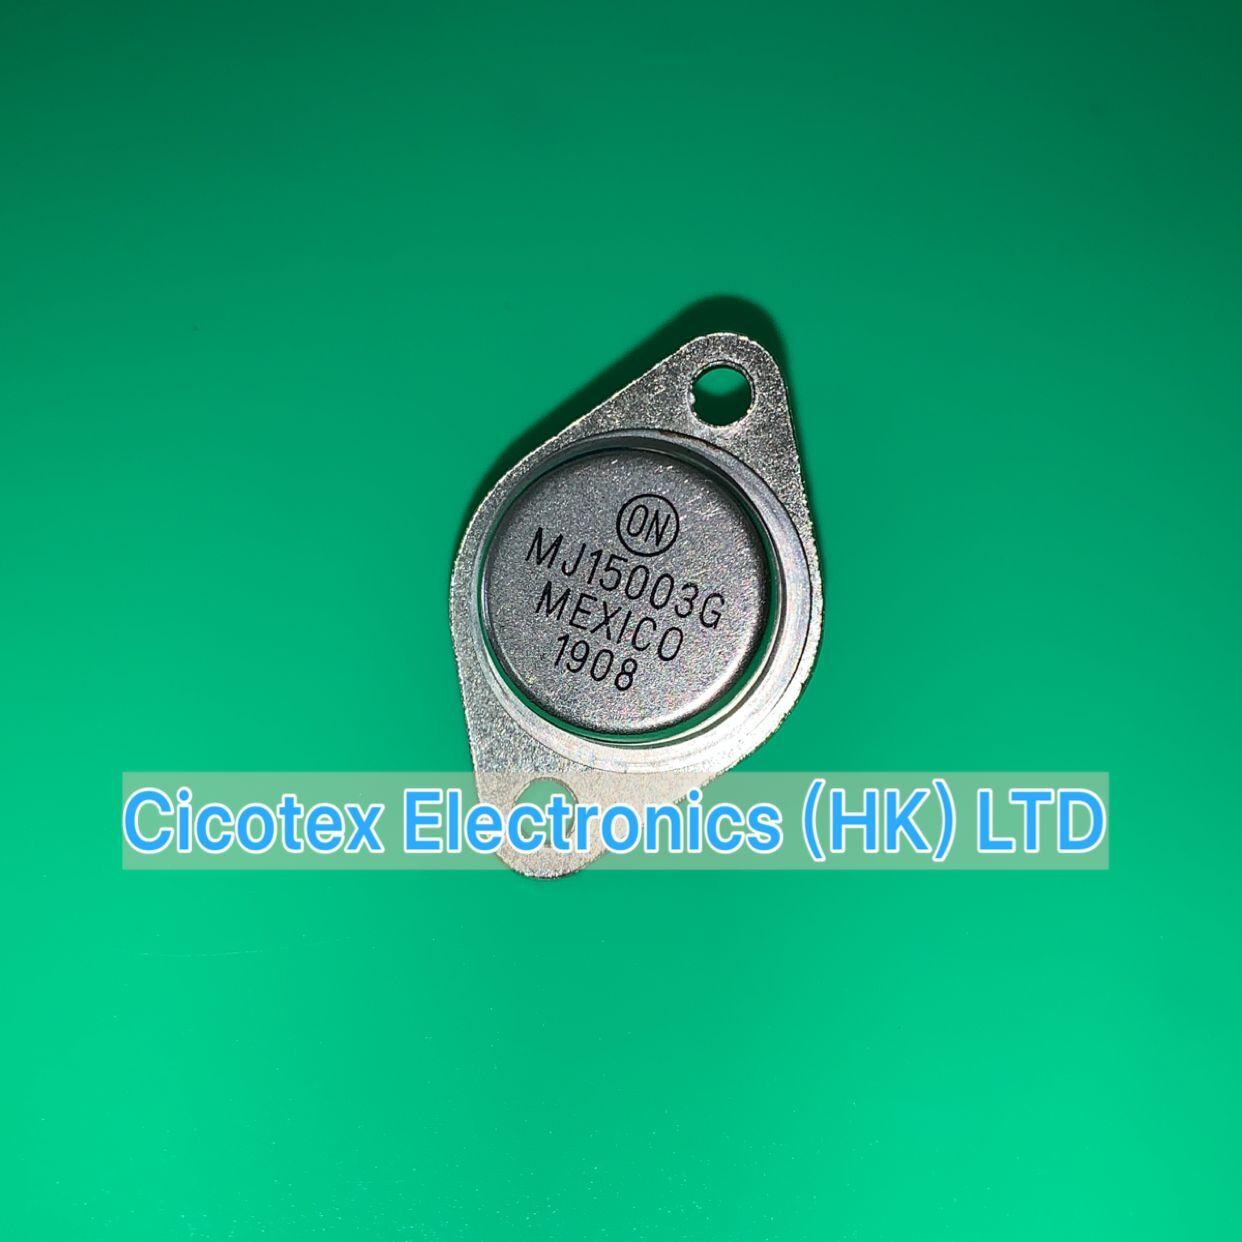 10 unids/lote MJ15003G TO3 MJ15003 G 15003 transistor NPN 140V 20A a 3 15003G 15003-G